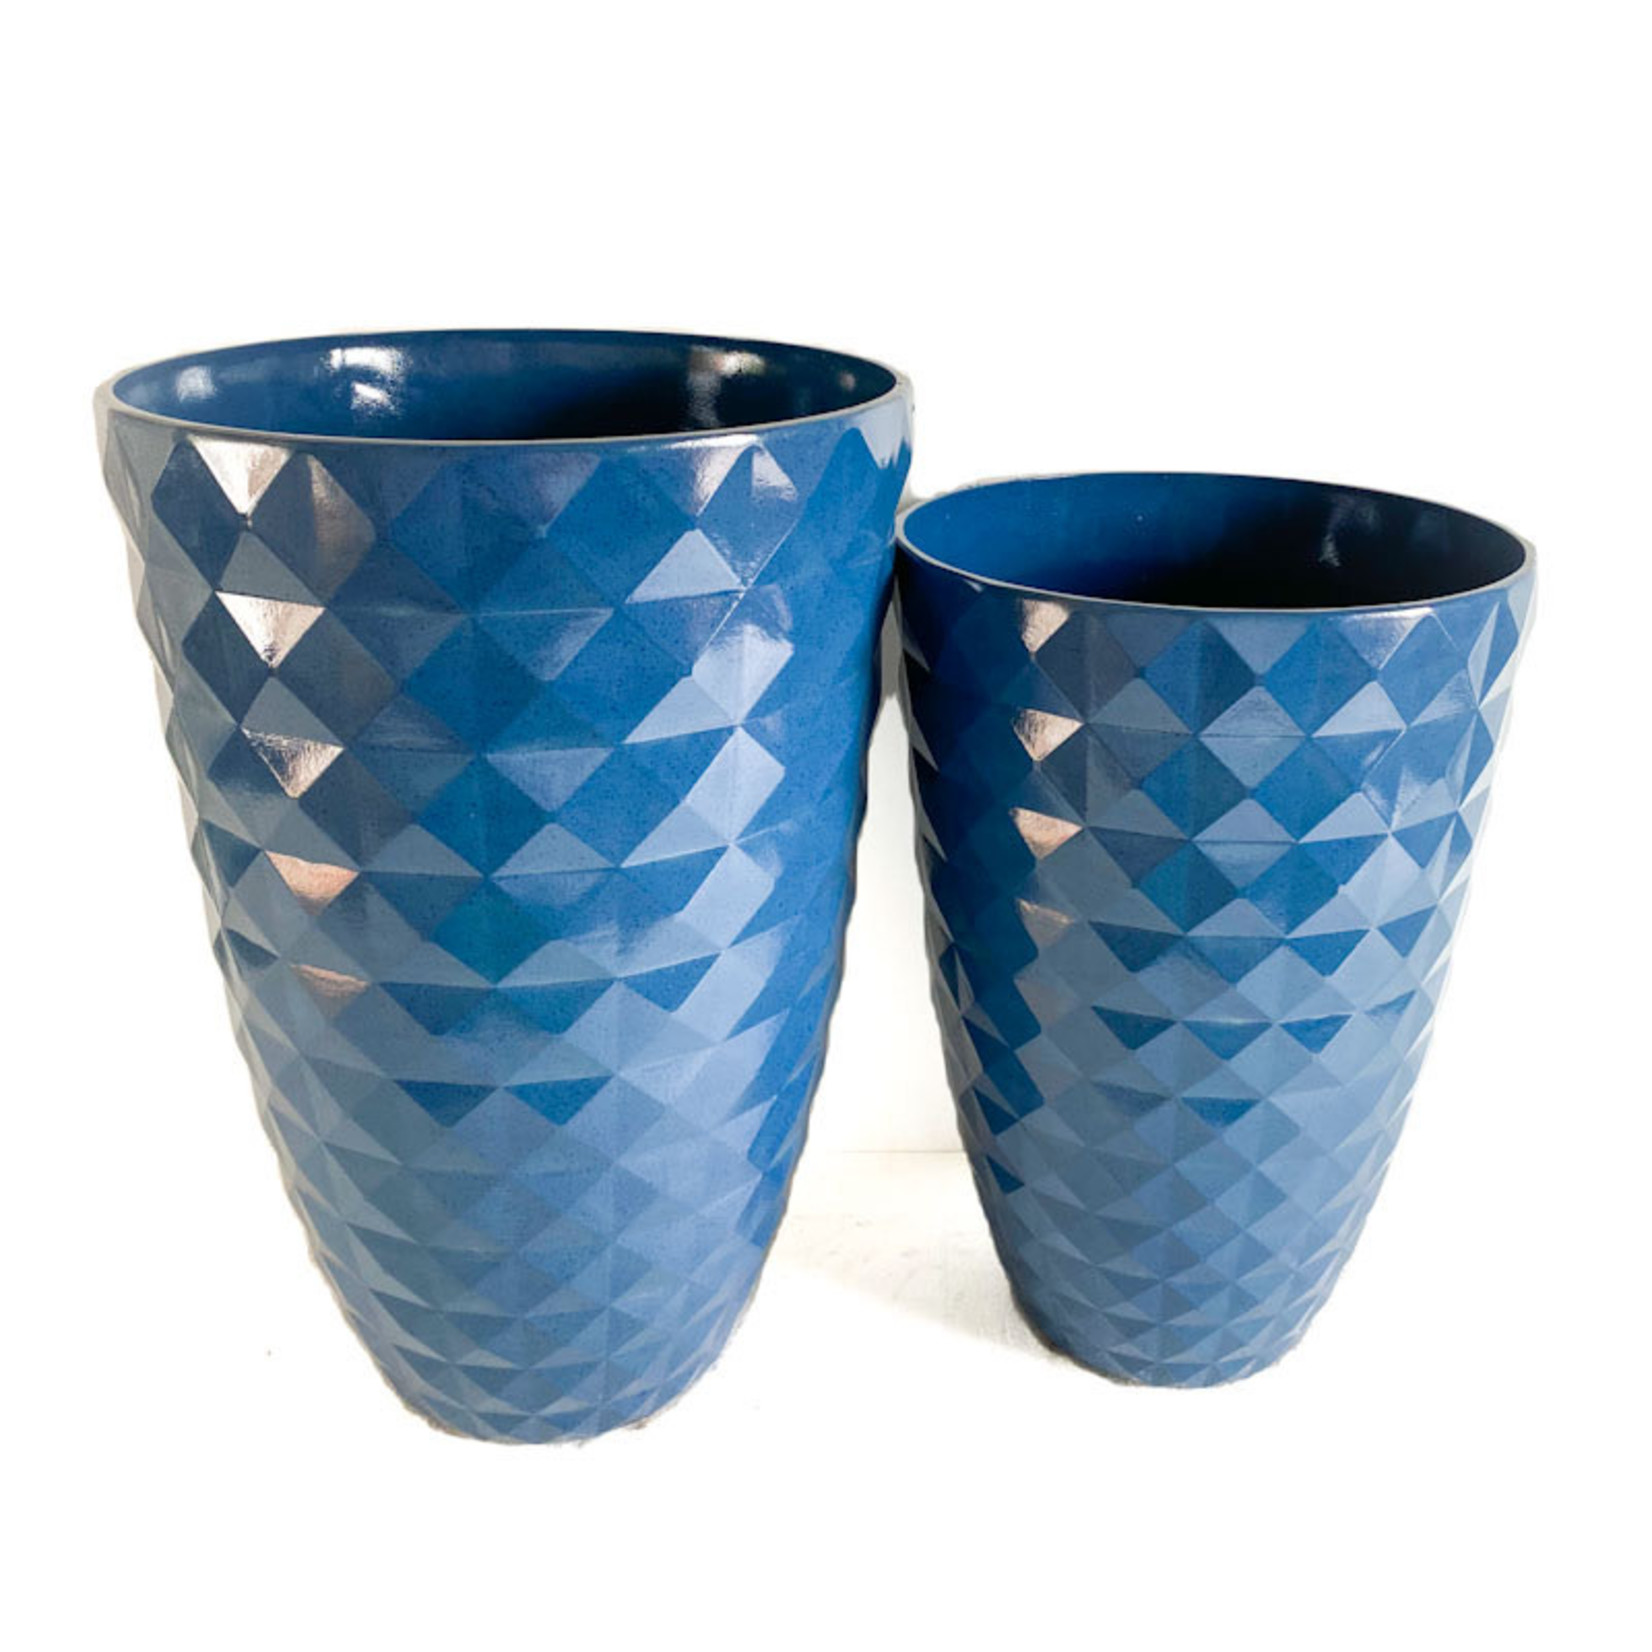 Raised Square Planter - Blueberry Glaze